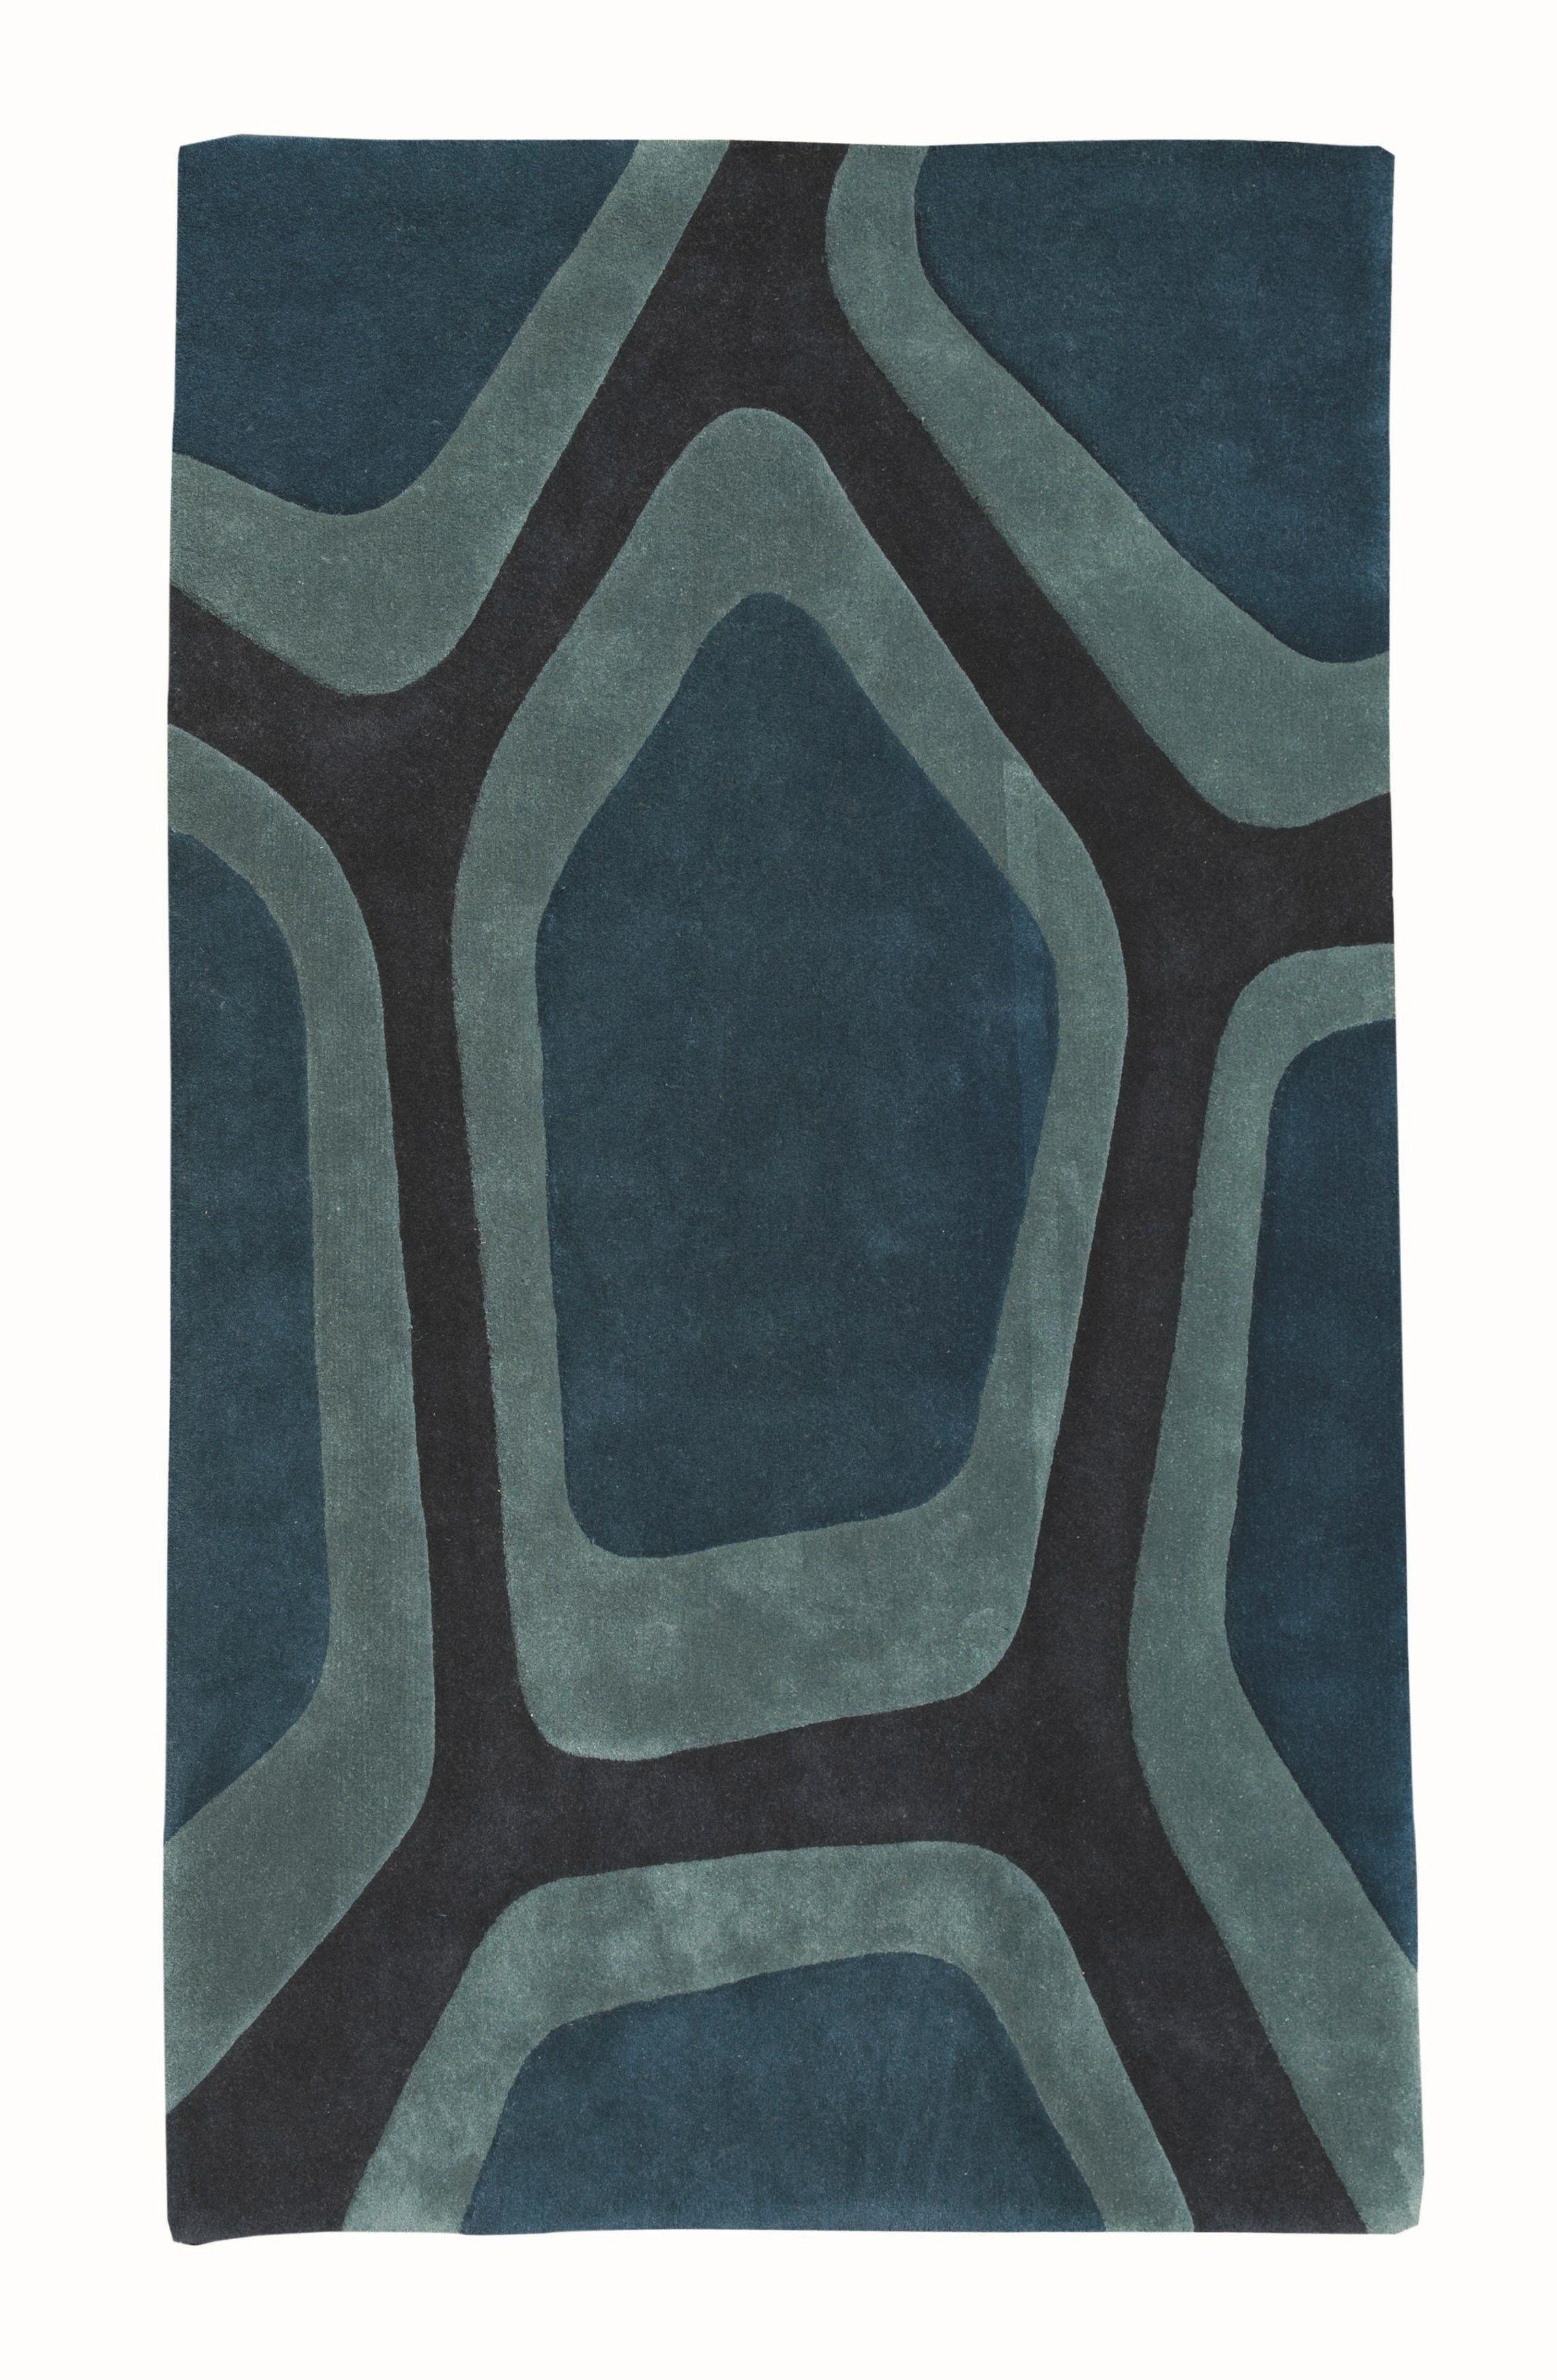 tapis rectangulaire en laine ora ito tapis roche bobois. Black Bedroom Furniture Sets. Home Design Ideas